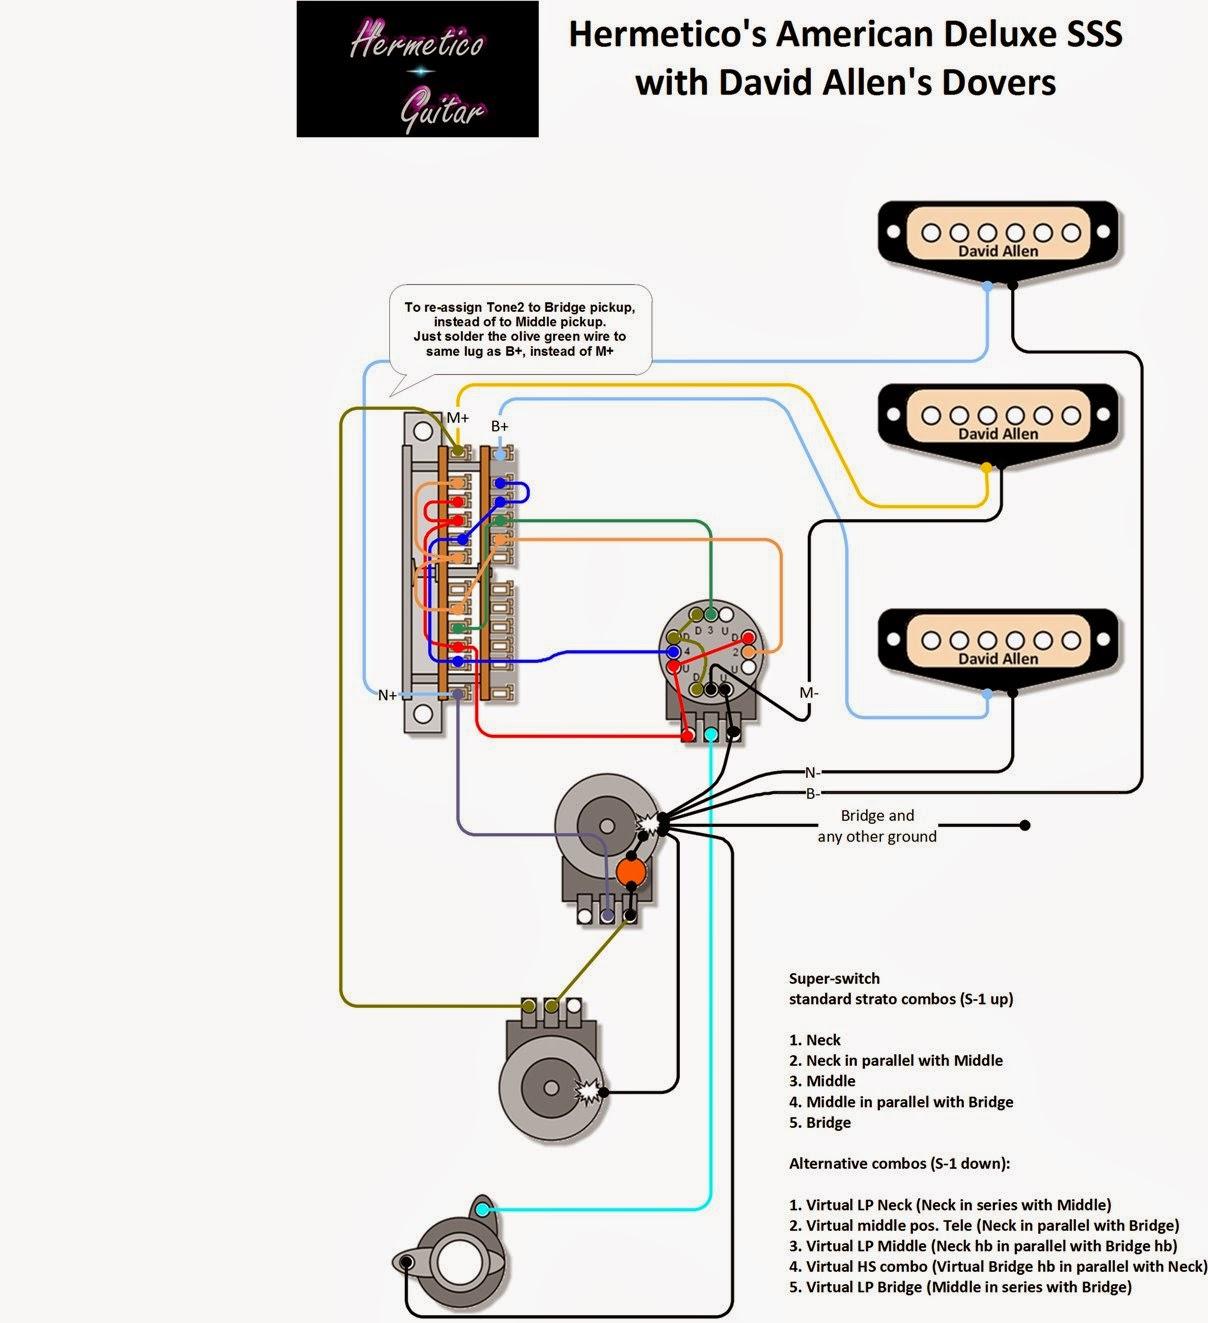 fender tele noiseless wiring diagram: hermetico guitar: fender american  deluxe sss (2010 model